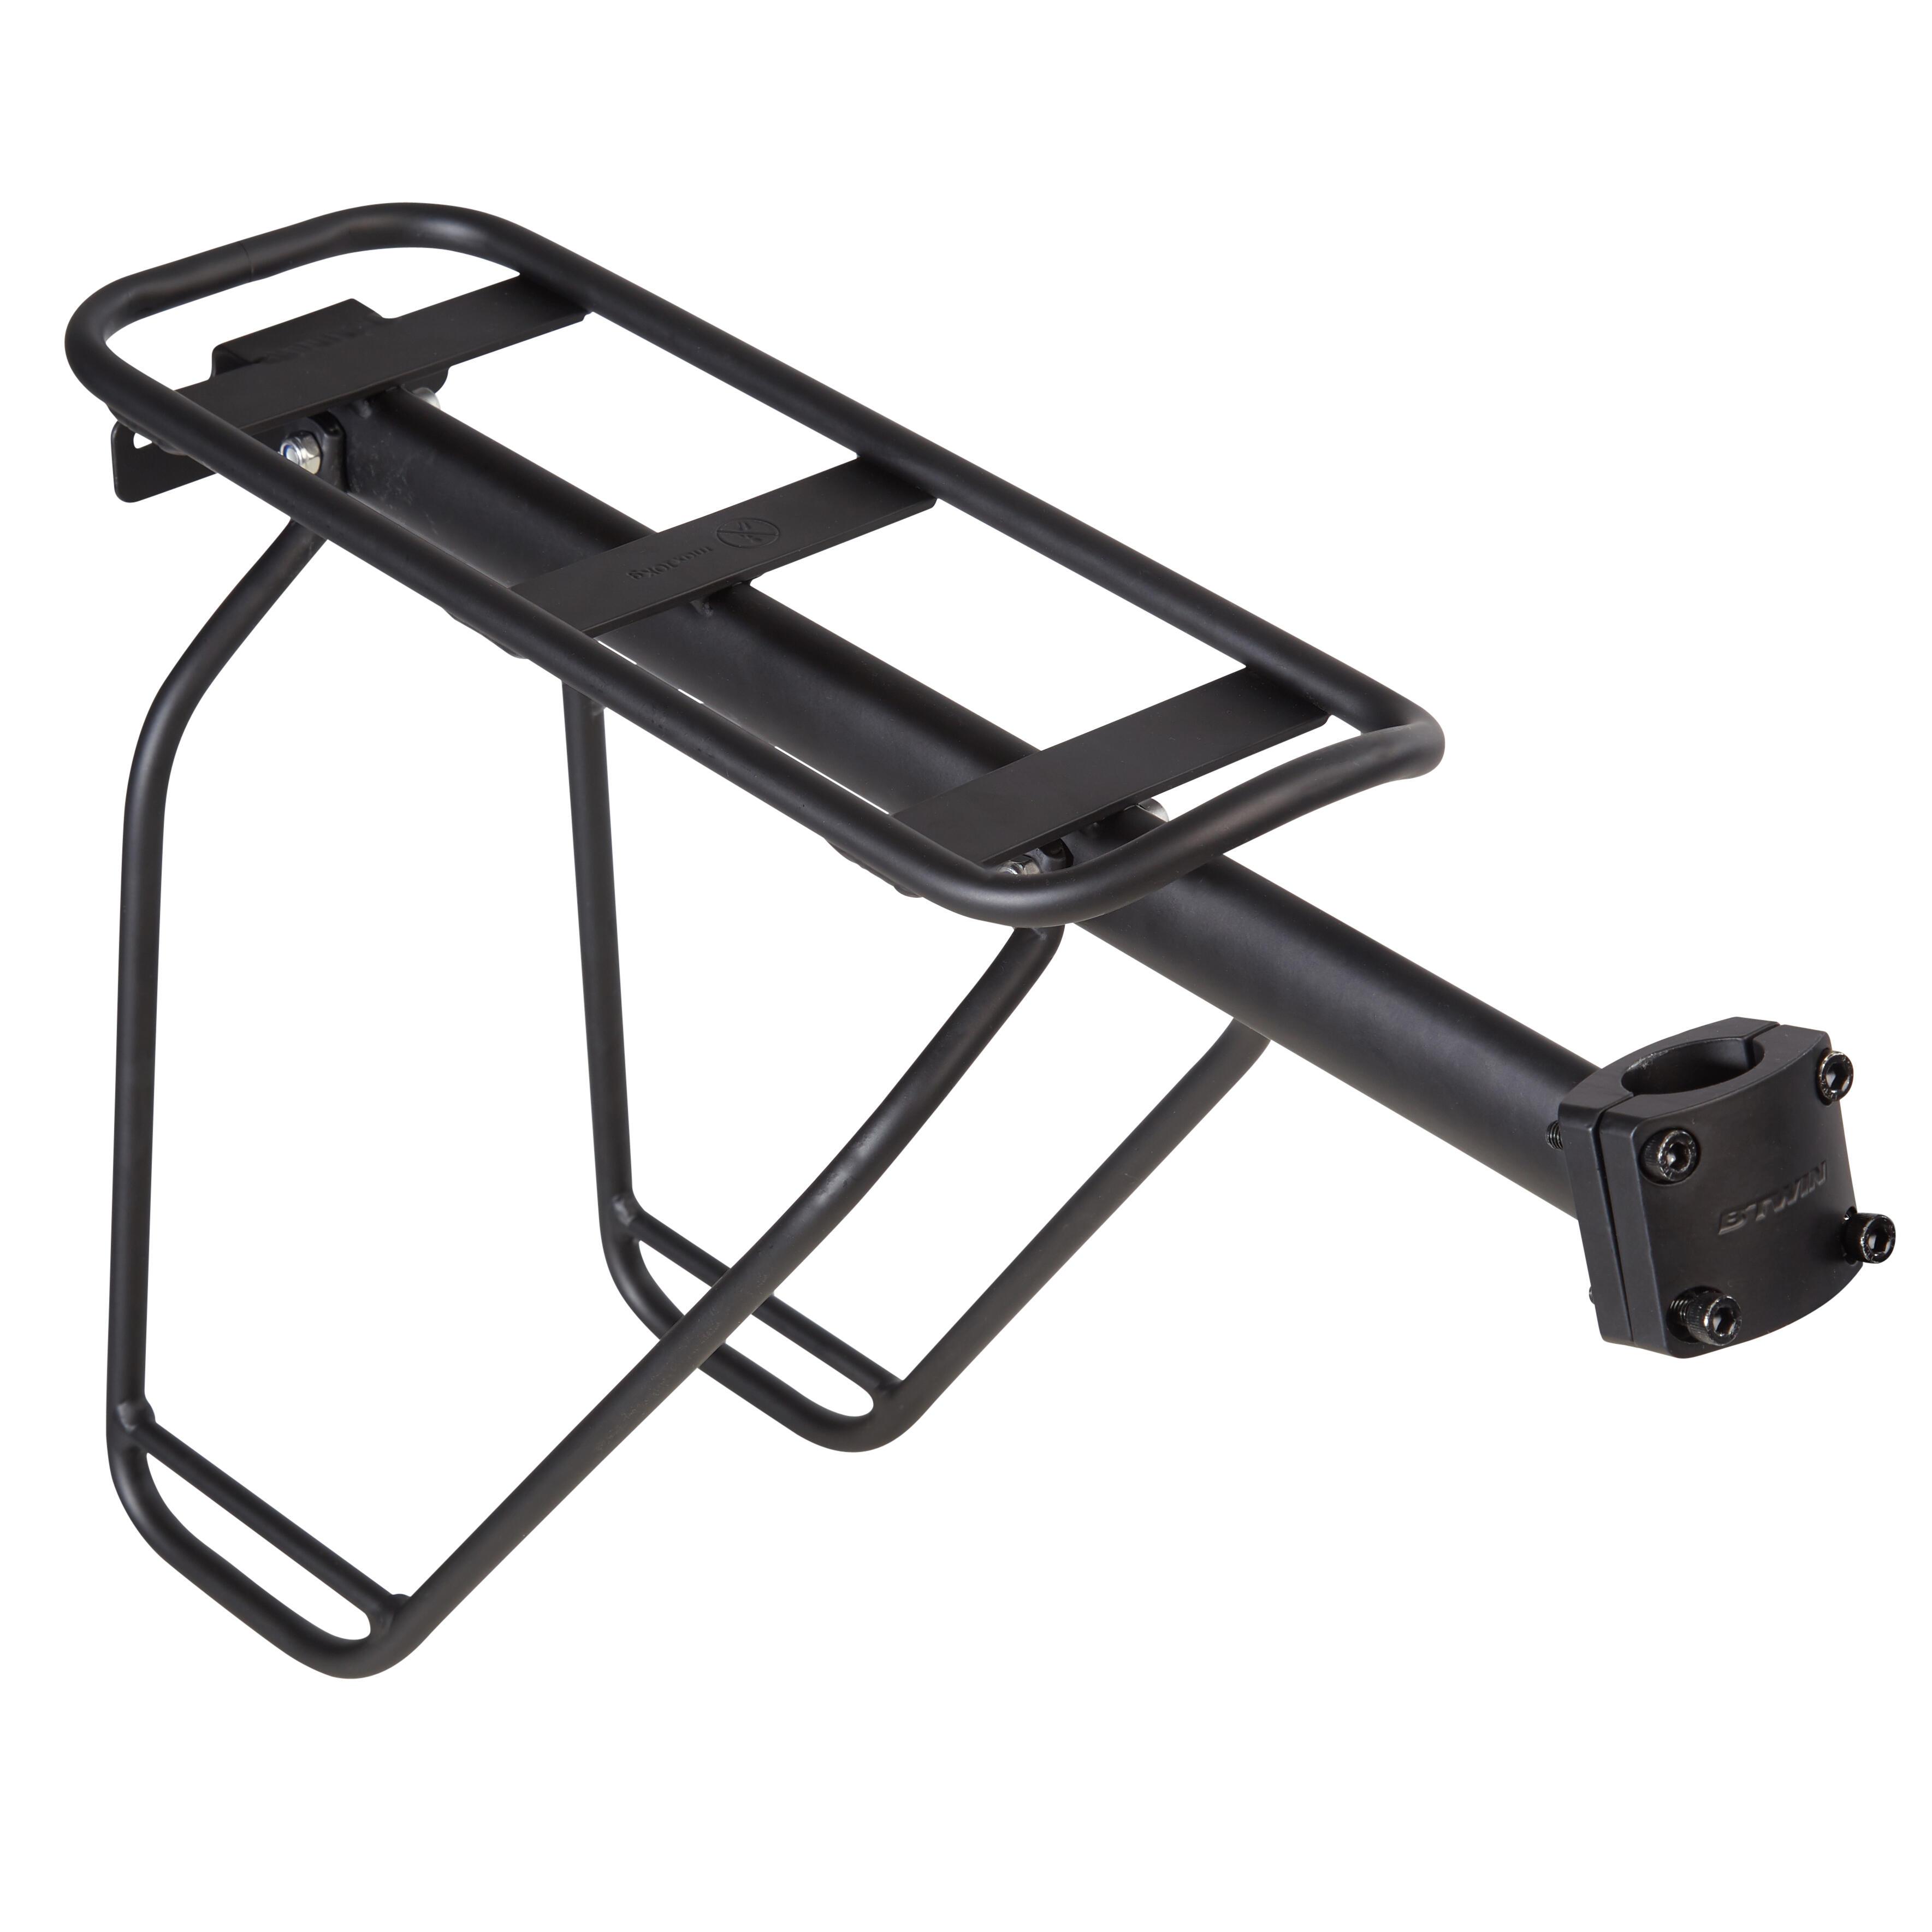 500 Seat Post Pannier Rack